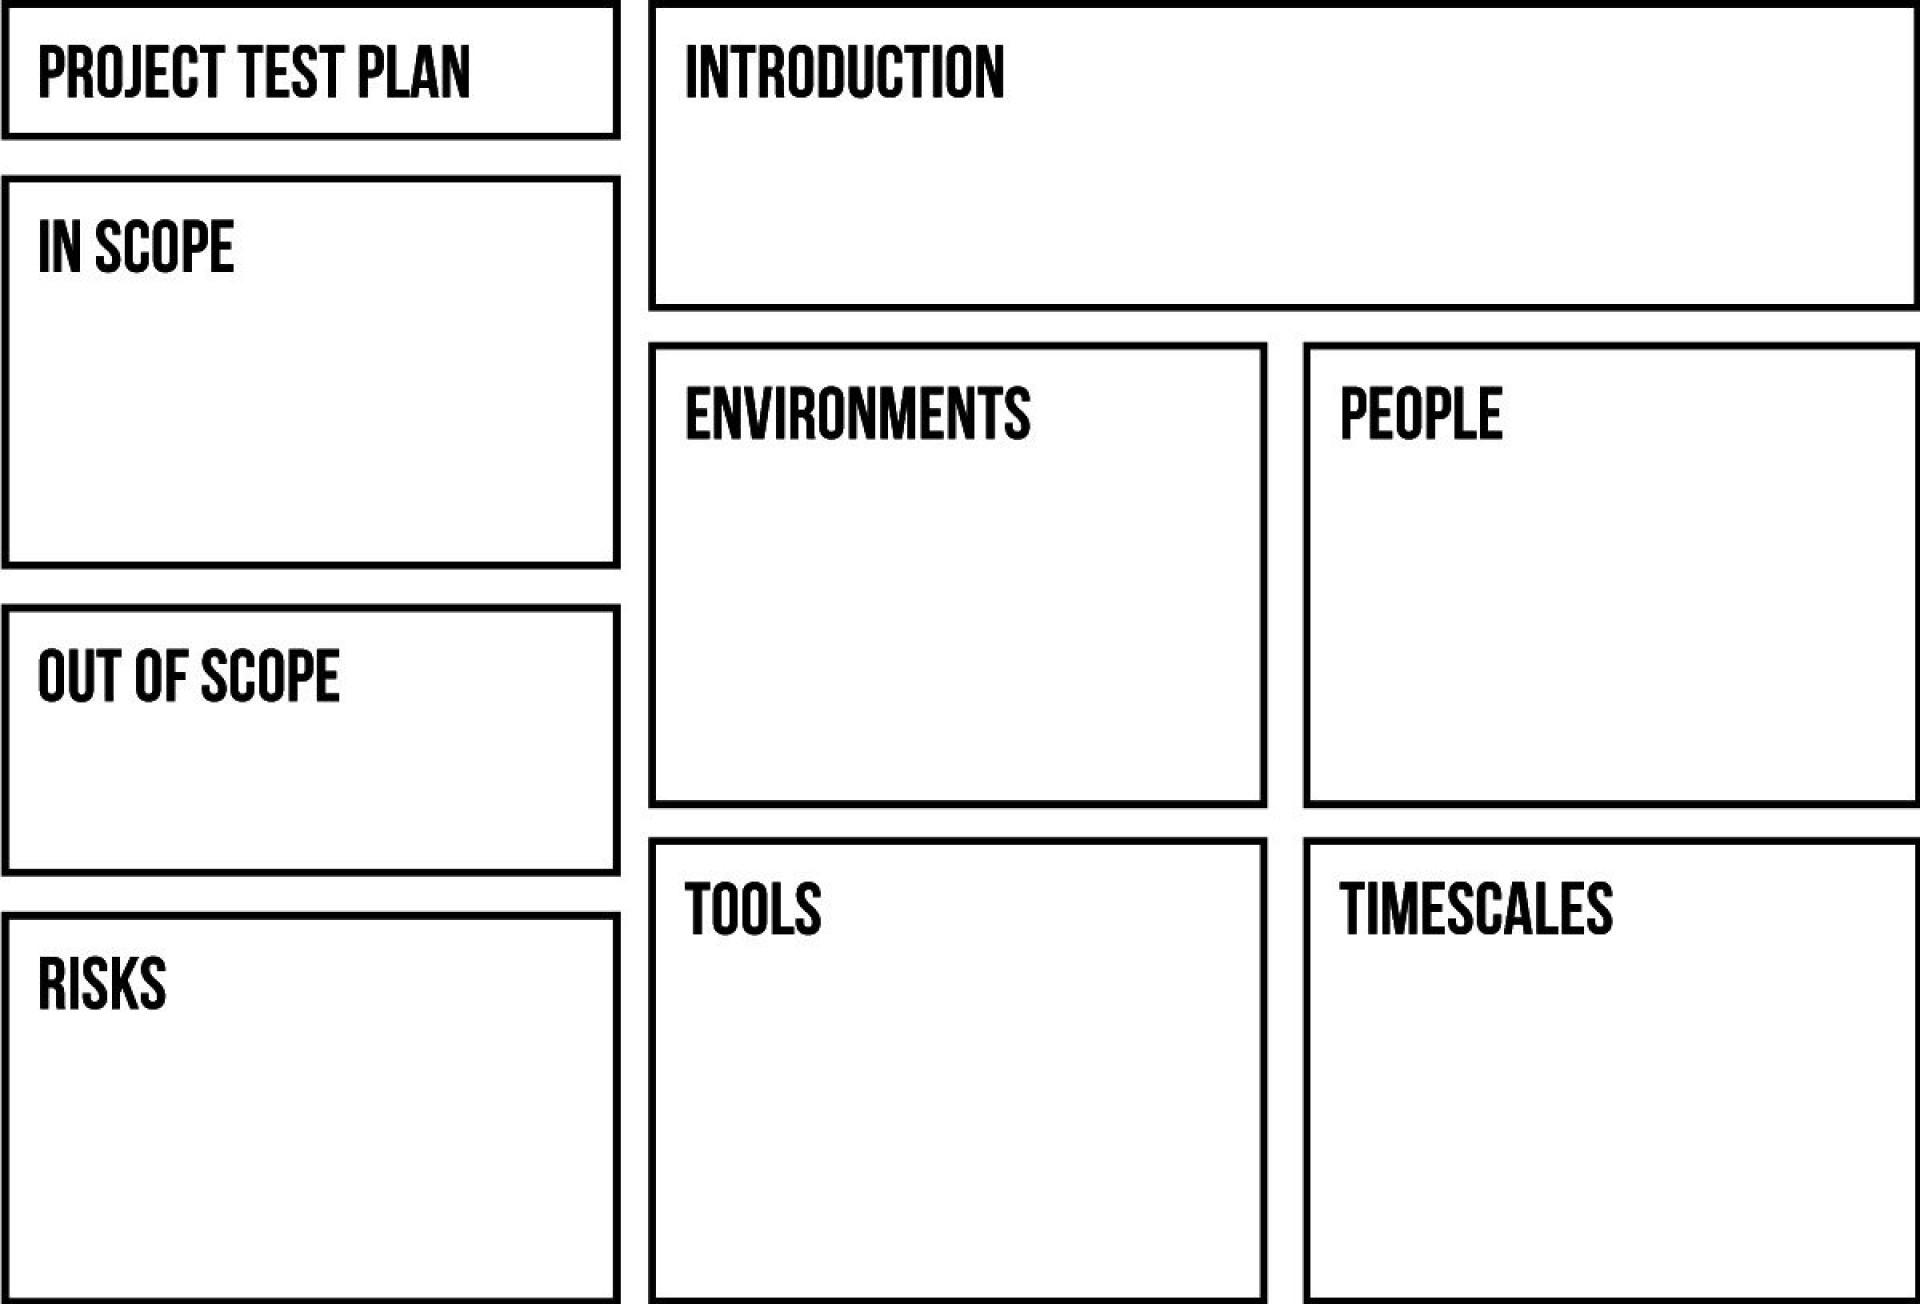 007 Phenomenal Agile Test Plan Template Sample  Word Example Document1920